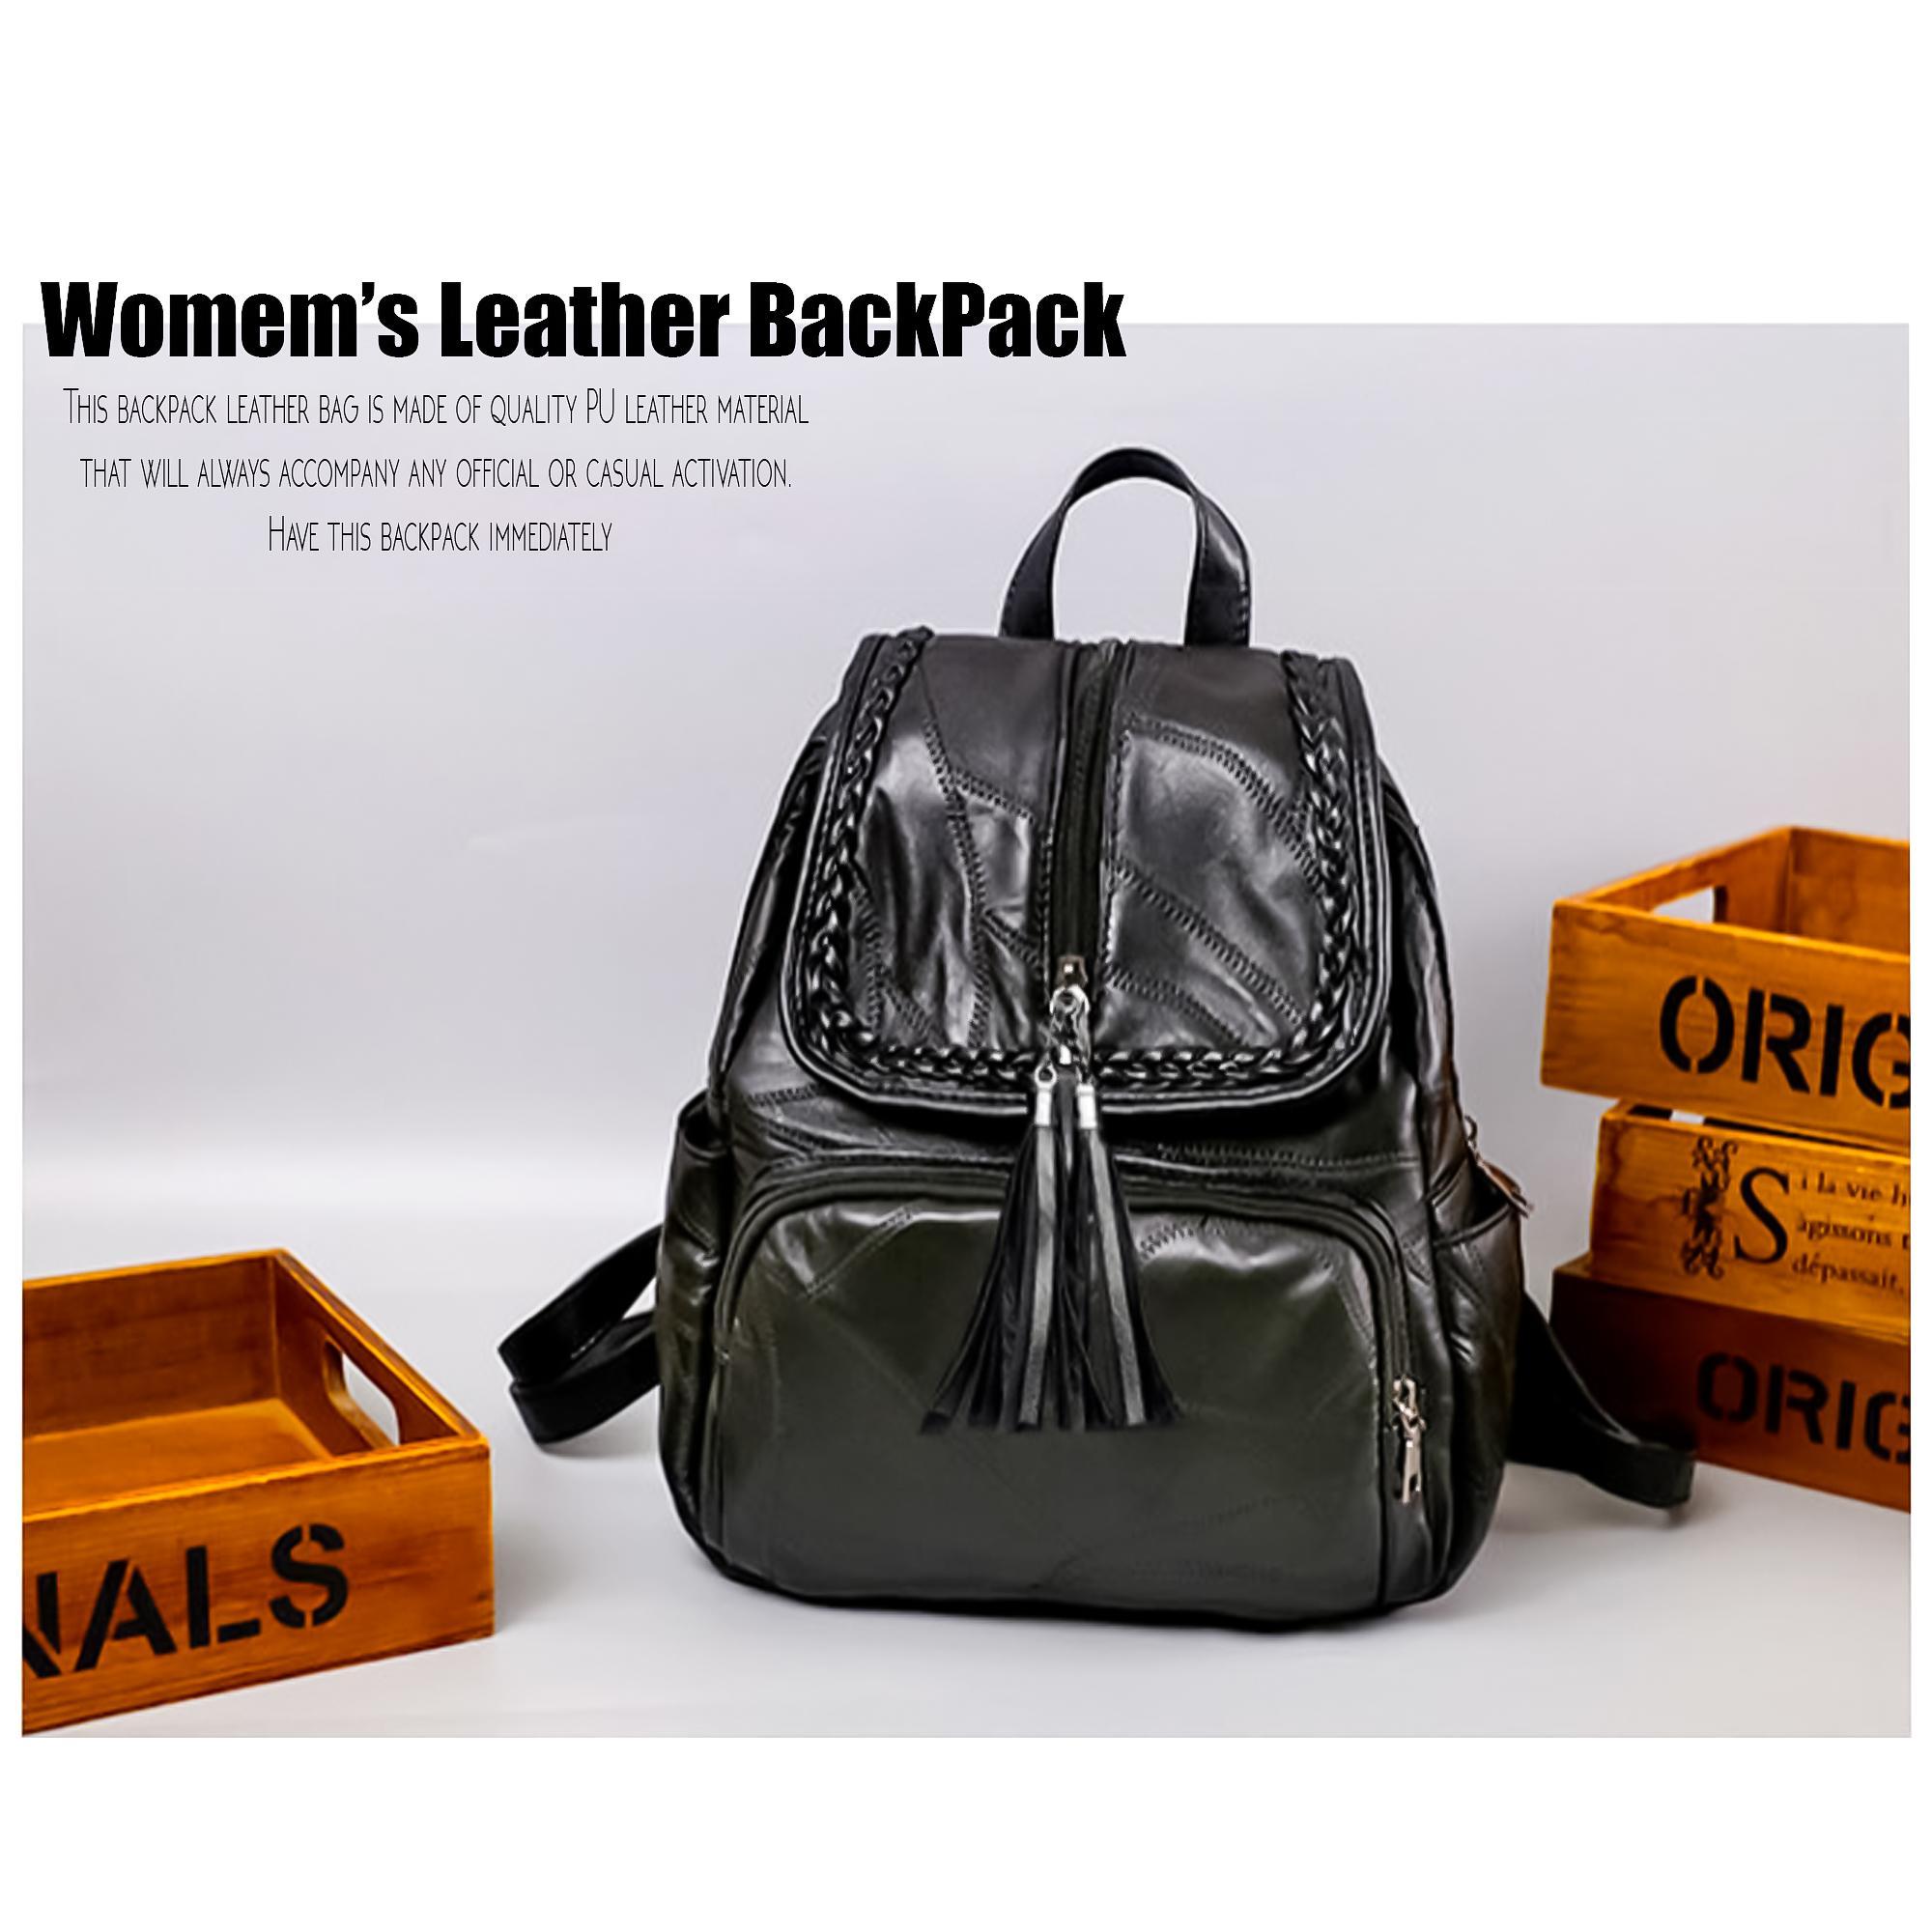 Tas Ransel Import Tas Backpack Tas Ransel Wanita Backpack Wanita Tas  Travelling Tas Kerja Tas Kuliah 3013ca2bd9